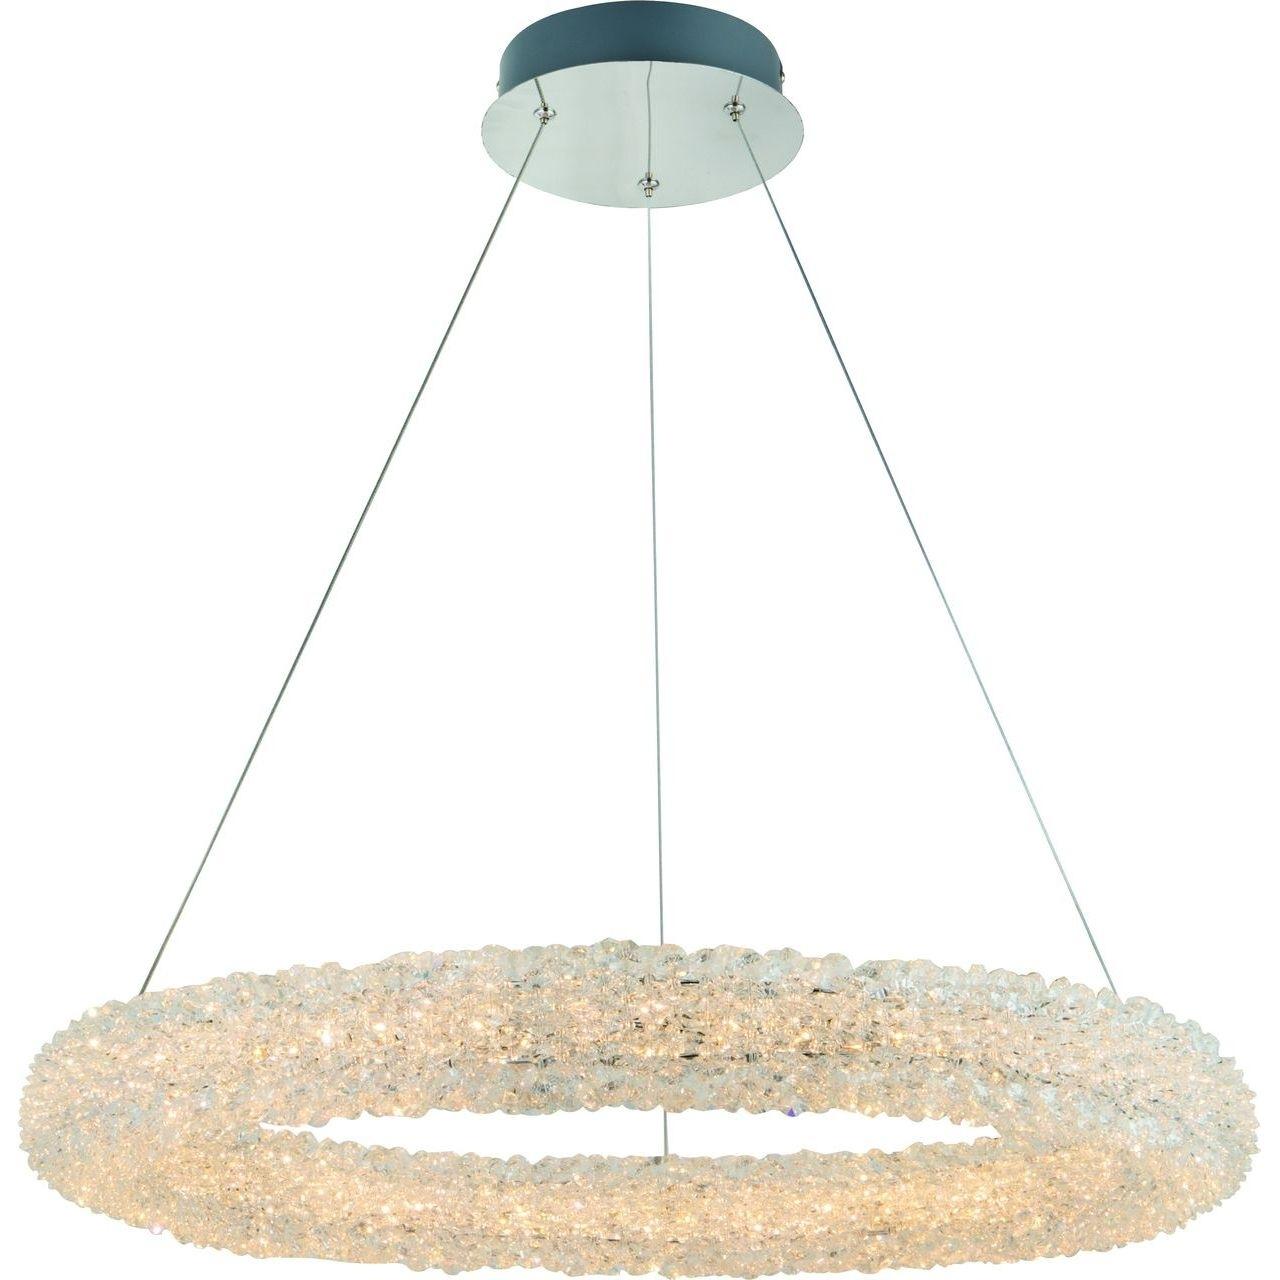 A1726SP-1CC Подвесная светодиодная люстра Arte Lamp Lorella